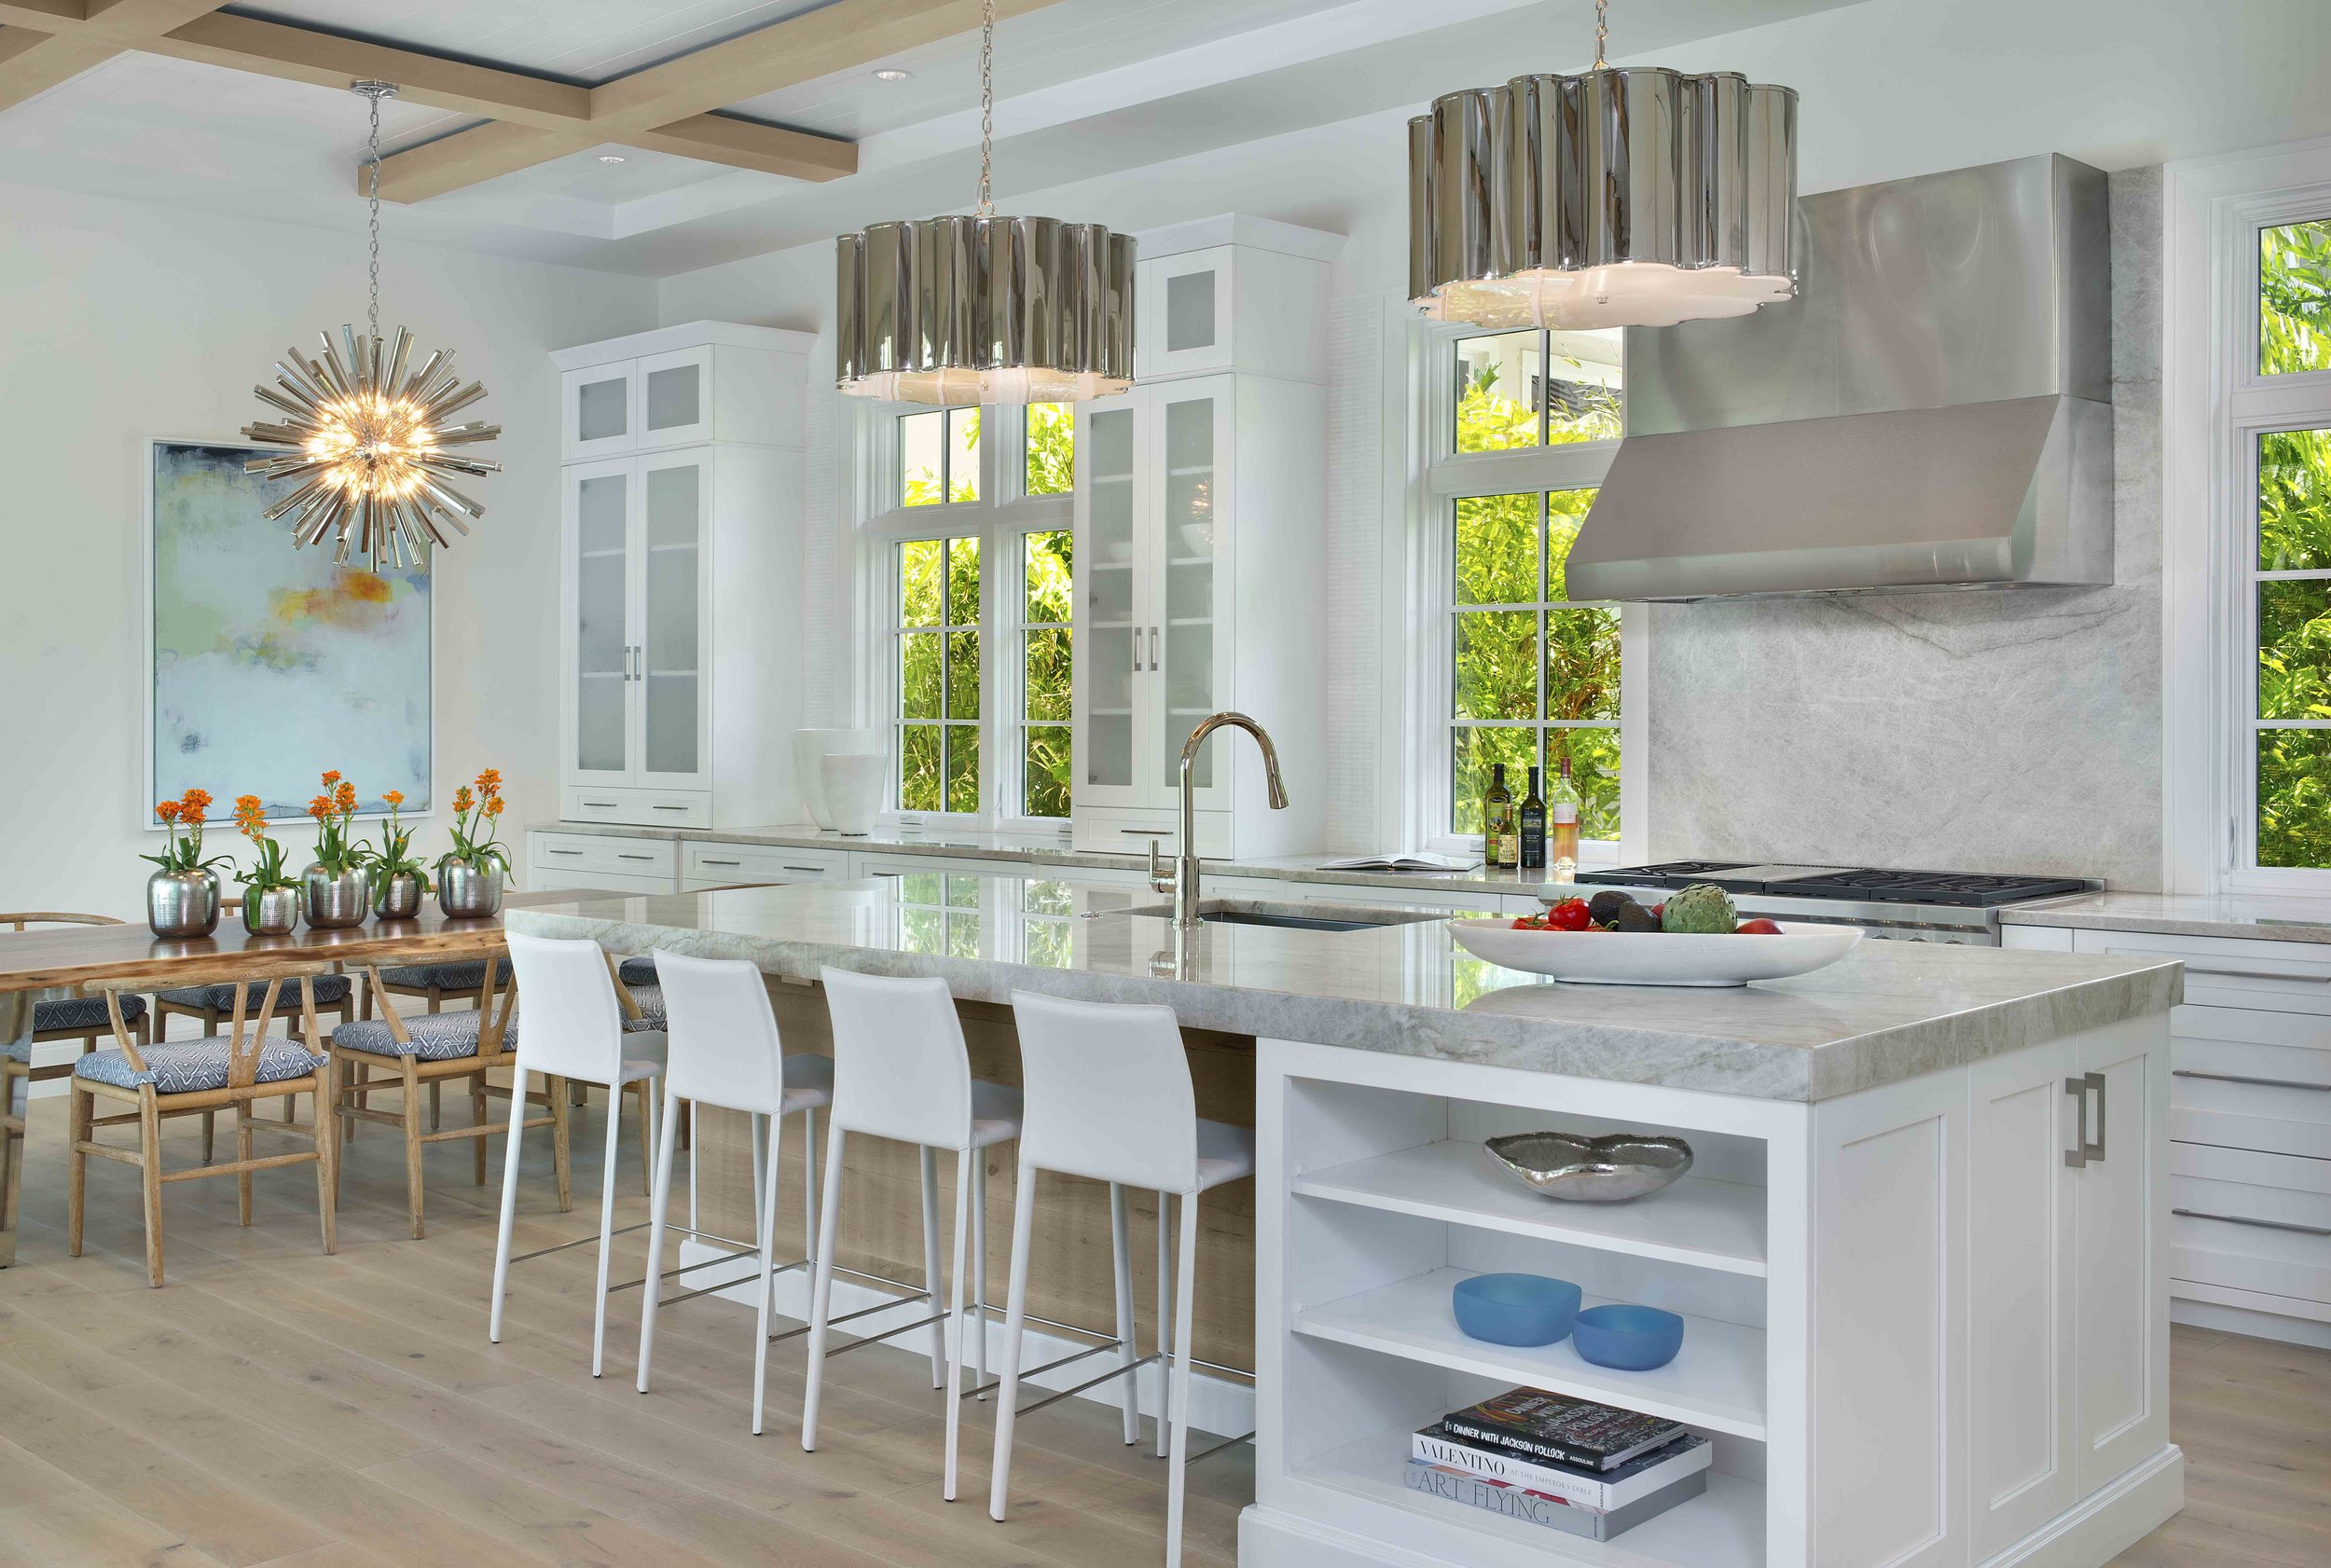 Audi Residence Kitchen & Dining Room.jpg